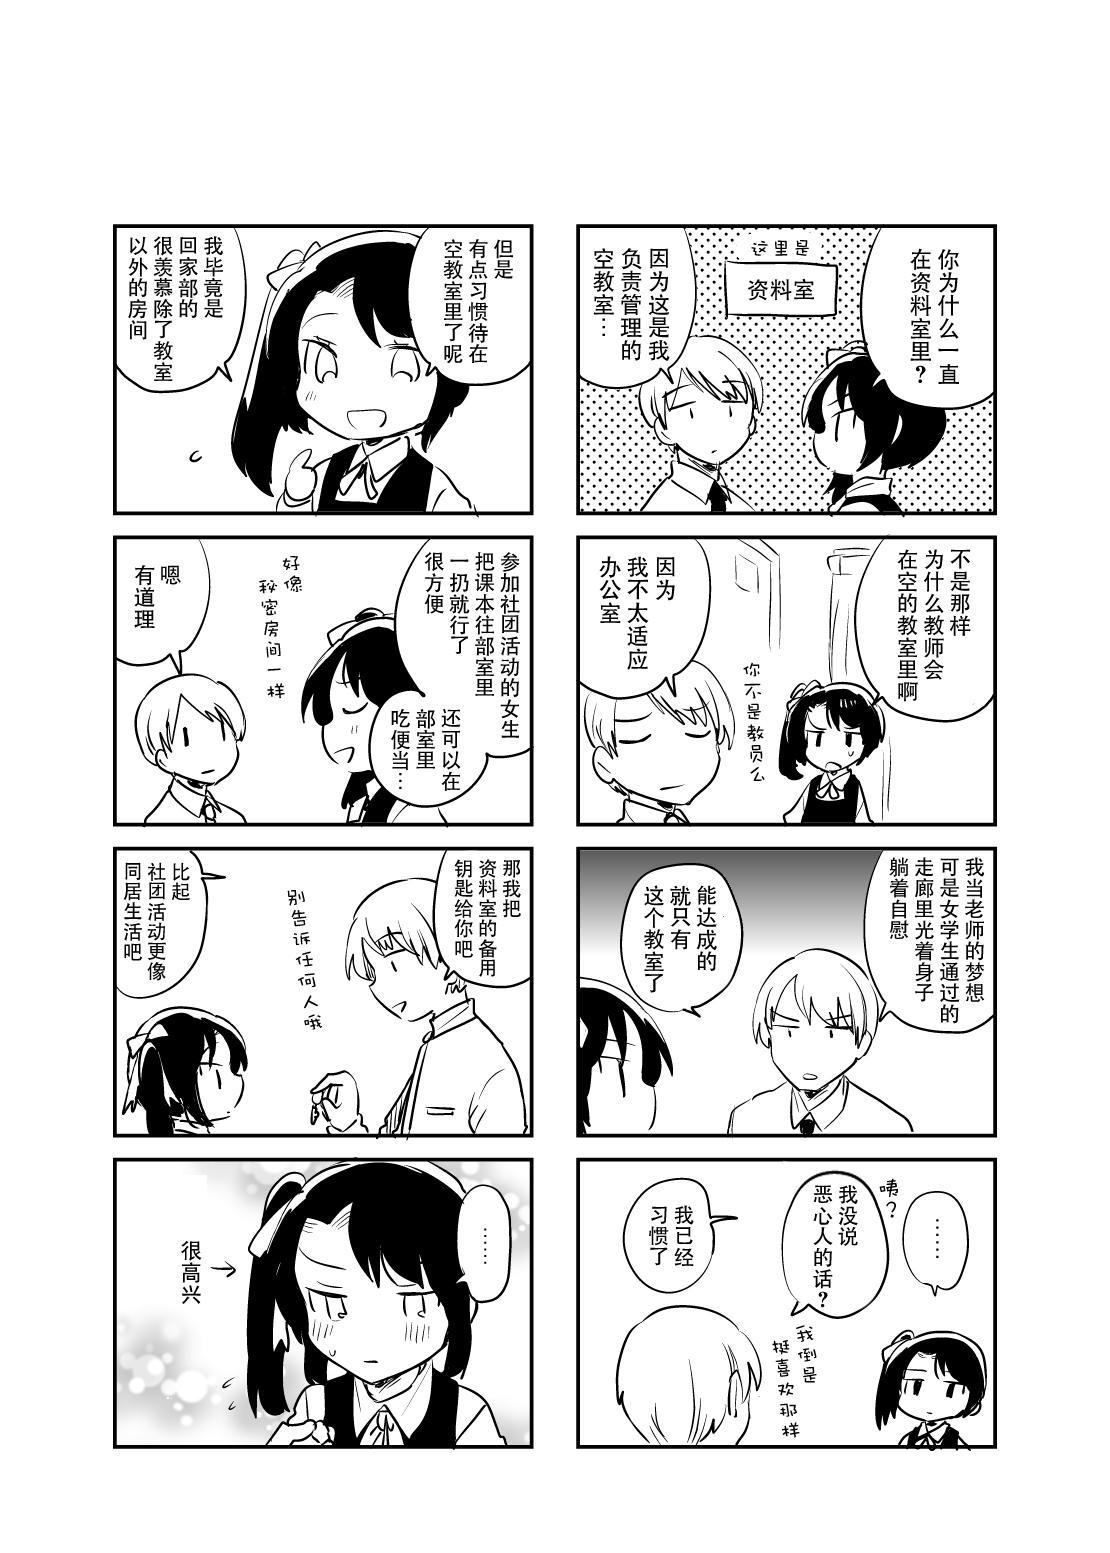 (SC2018 Spring) [squeezecandyheaven (Ichihaya)] Sensei wa Lolicon de Saitei Hentai no Gomikuzu [Zen] + Omake [Chinese] [脸肿汉化组] 28